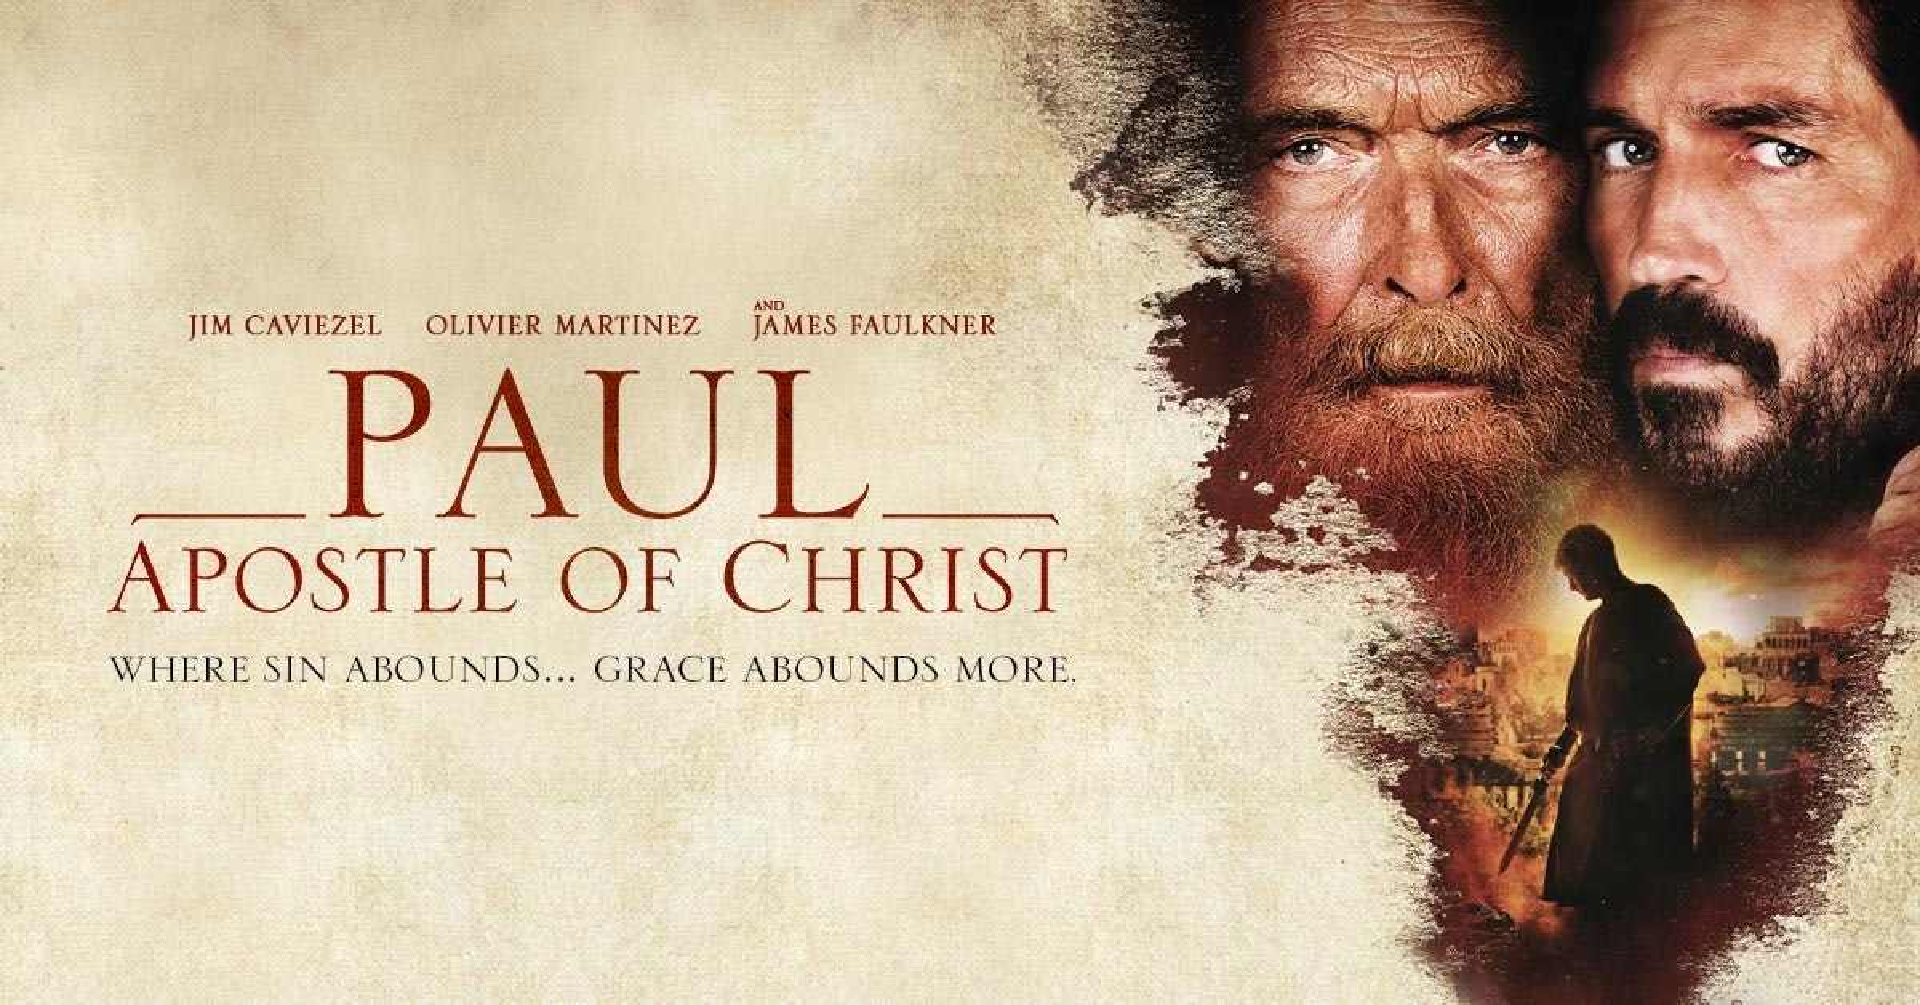 Great MEN of the Bible, St. PAUL: Secret of his success